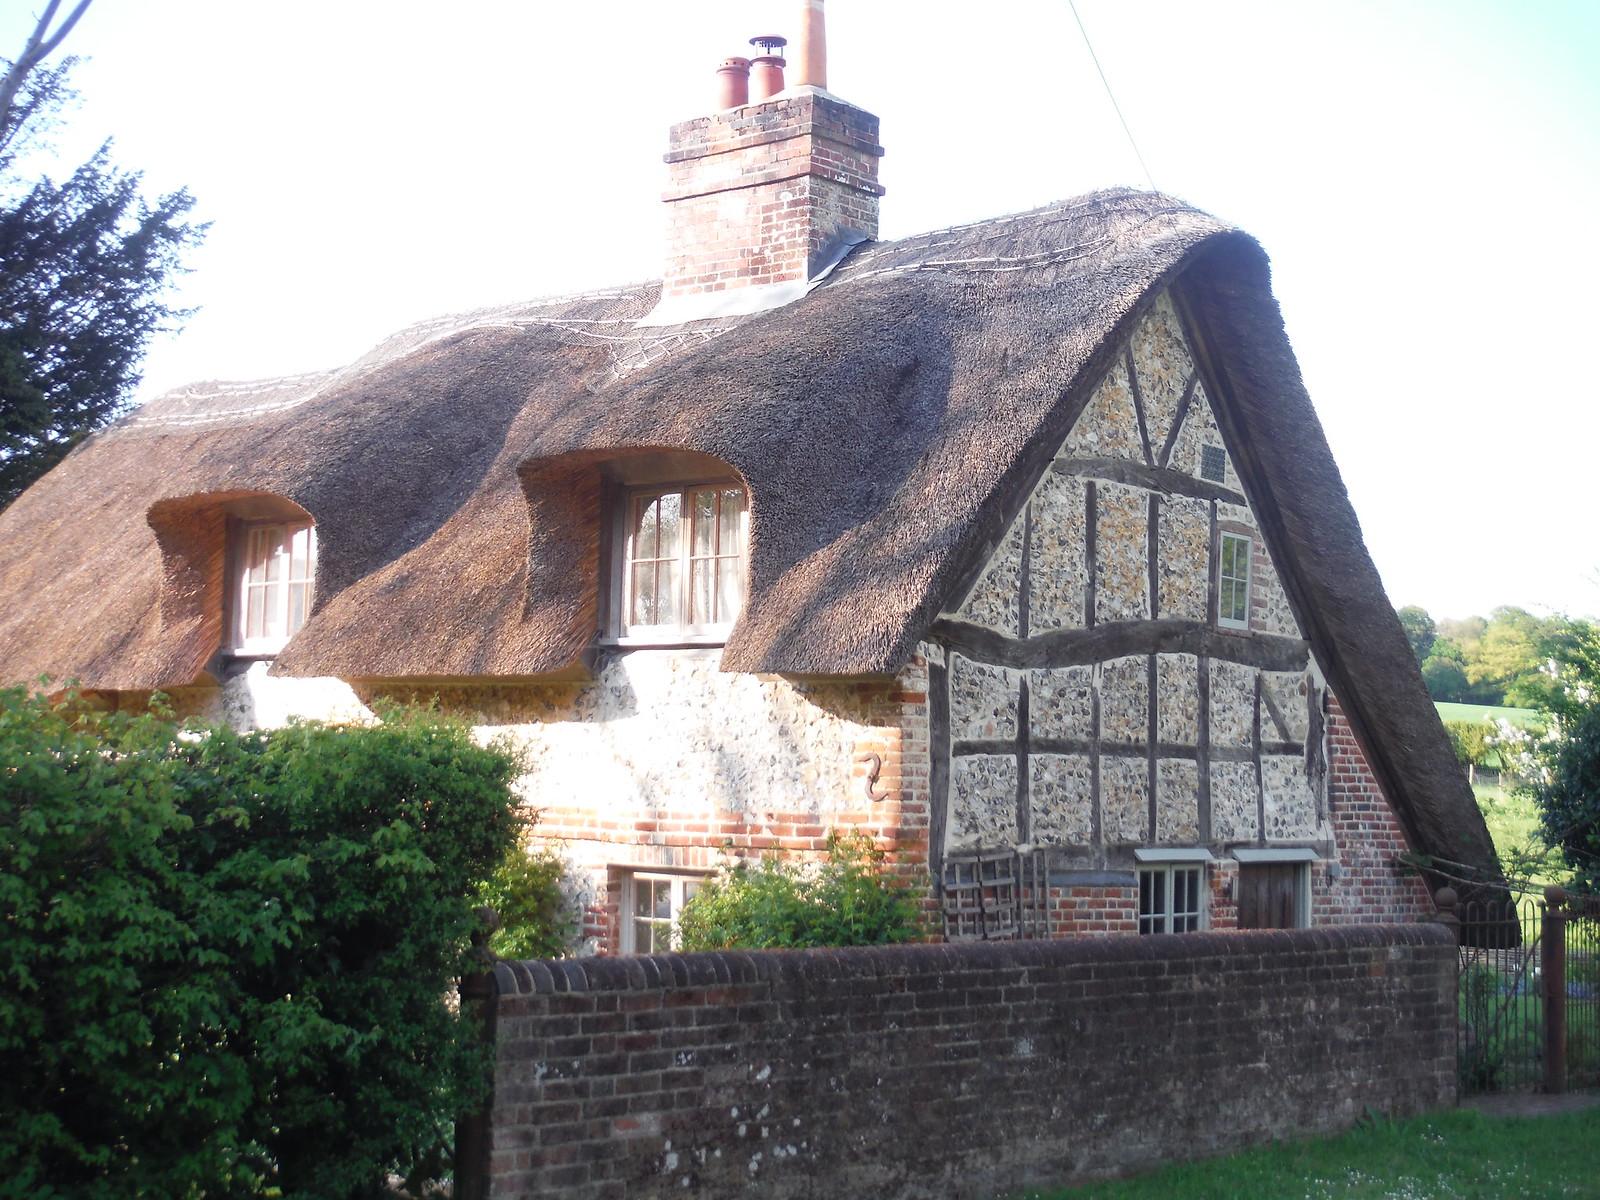 Flint-and-Brick Thatched Cottage, near South Holt Farm SWC Walk Rowlands Castle Circular